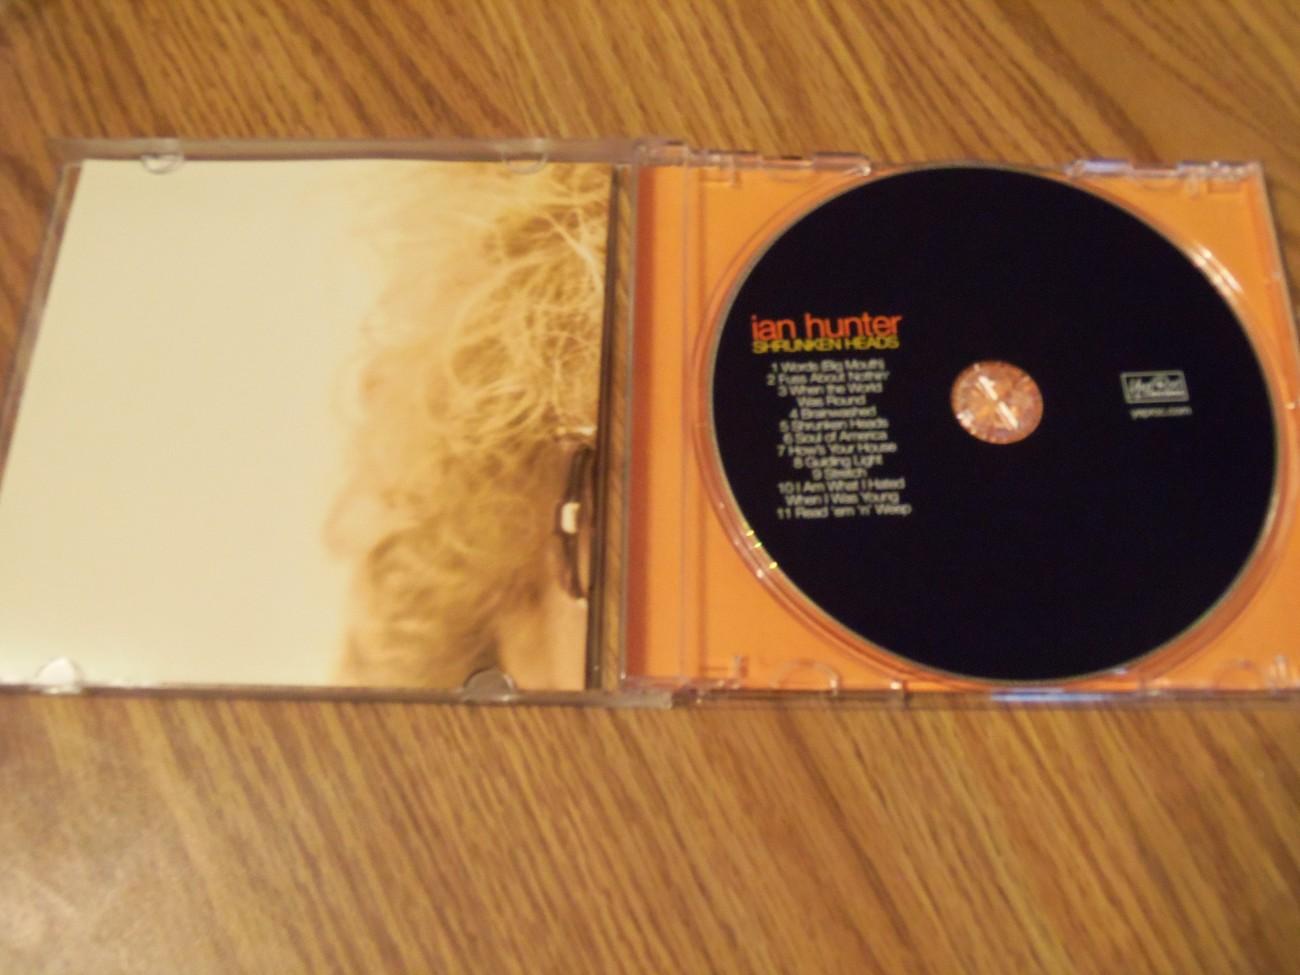 Ian Hunter Shrunken Heads Cd 2007 Mott The Hoople David Bowie